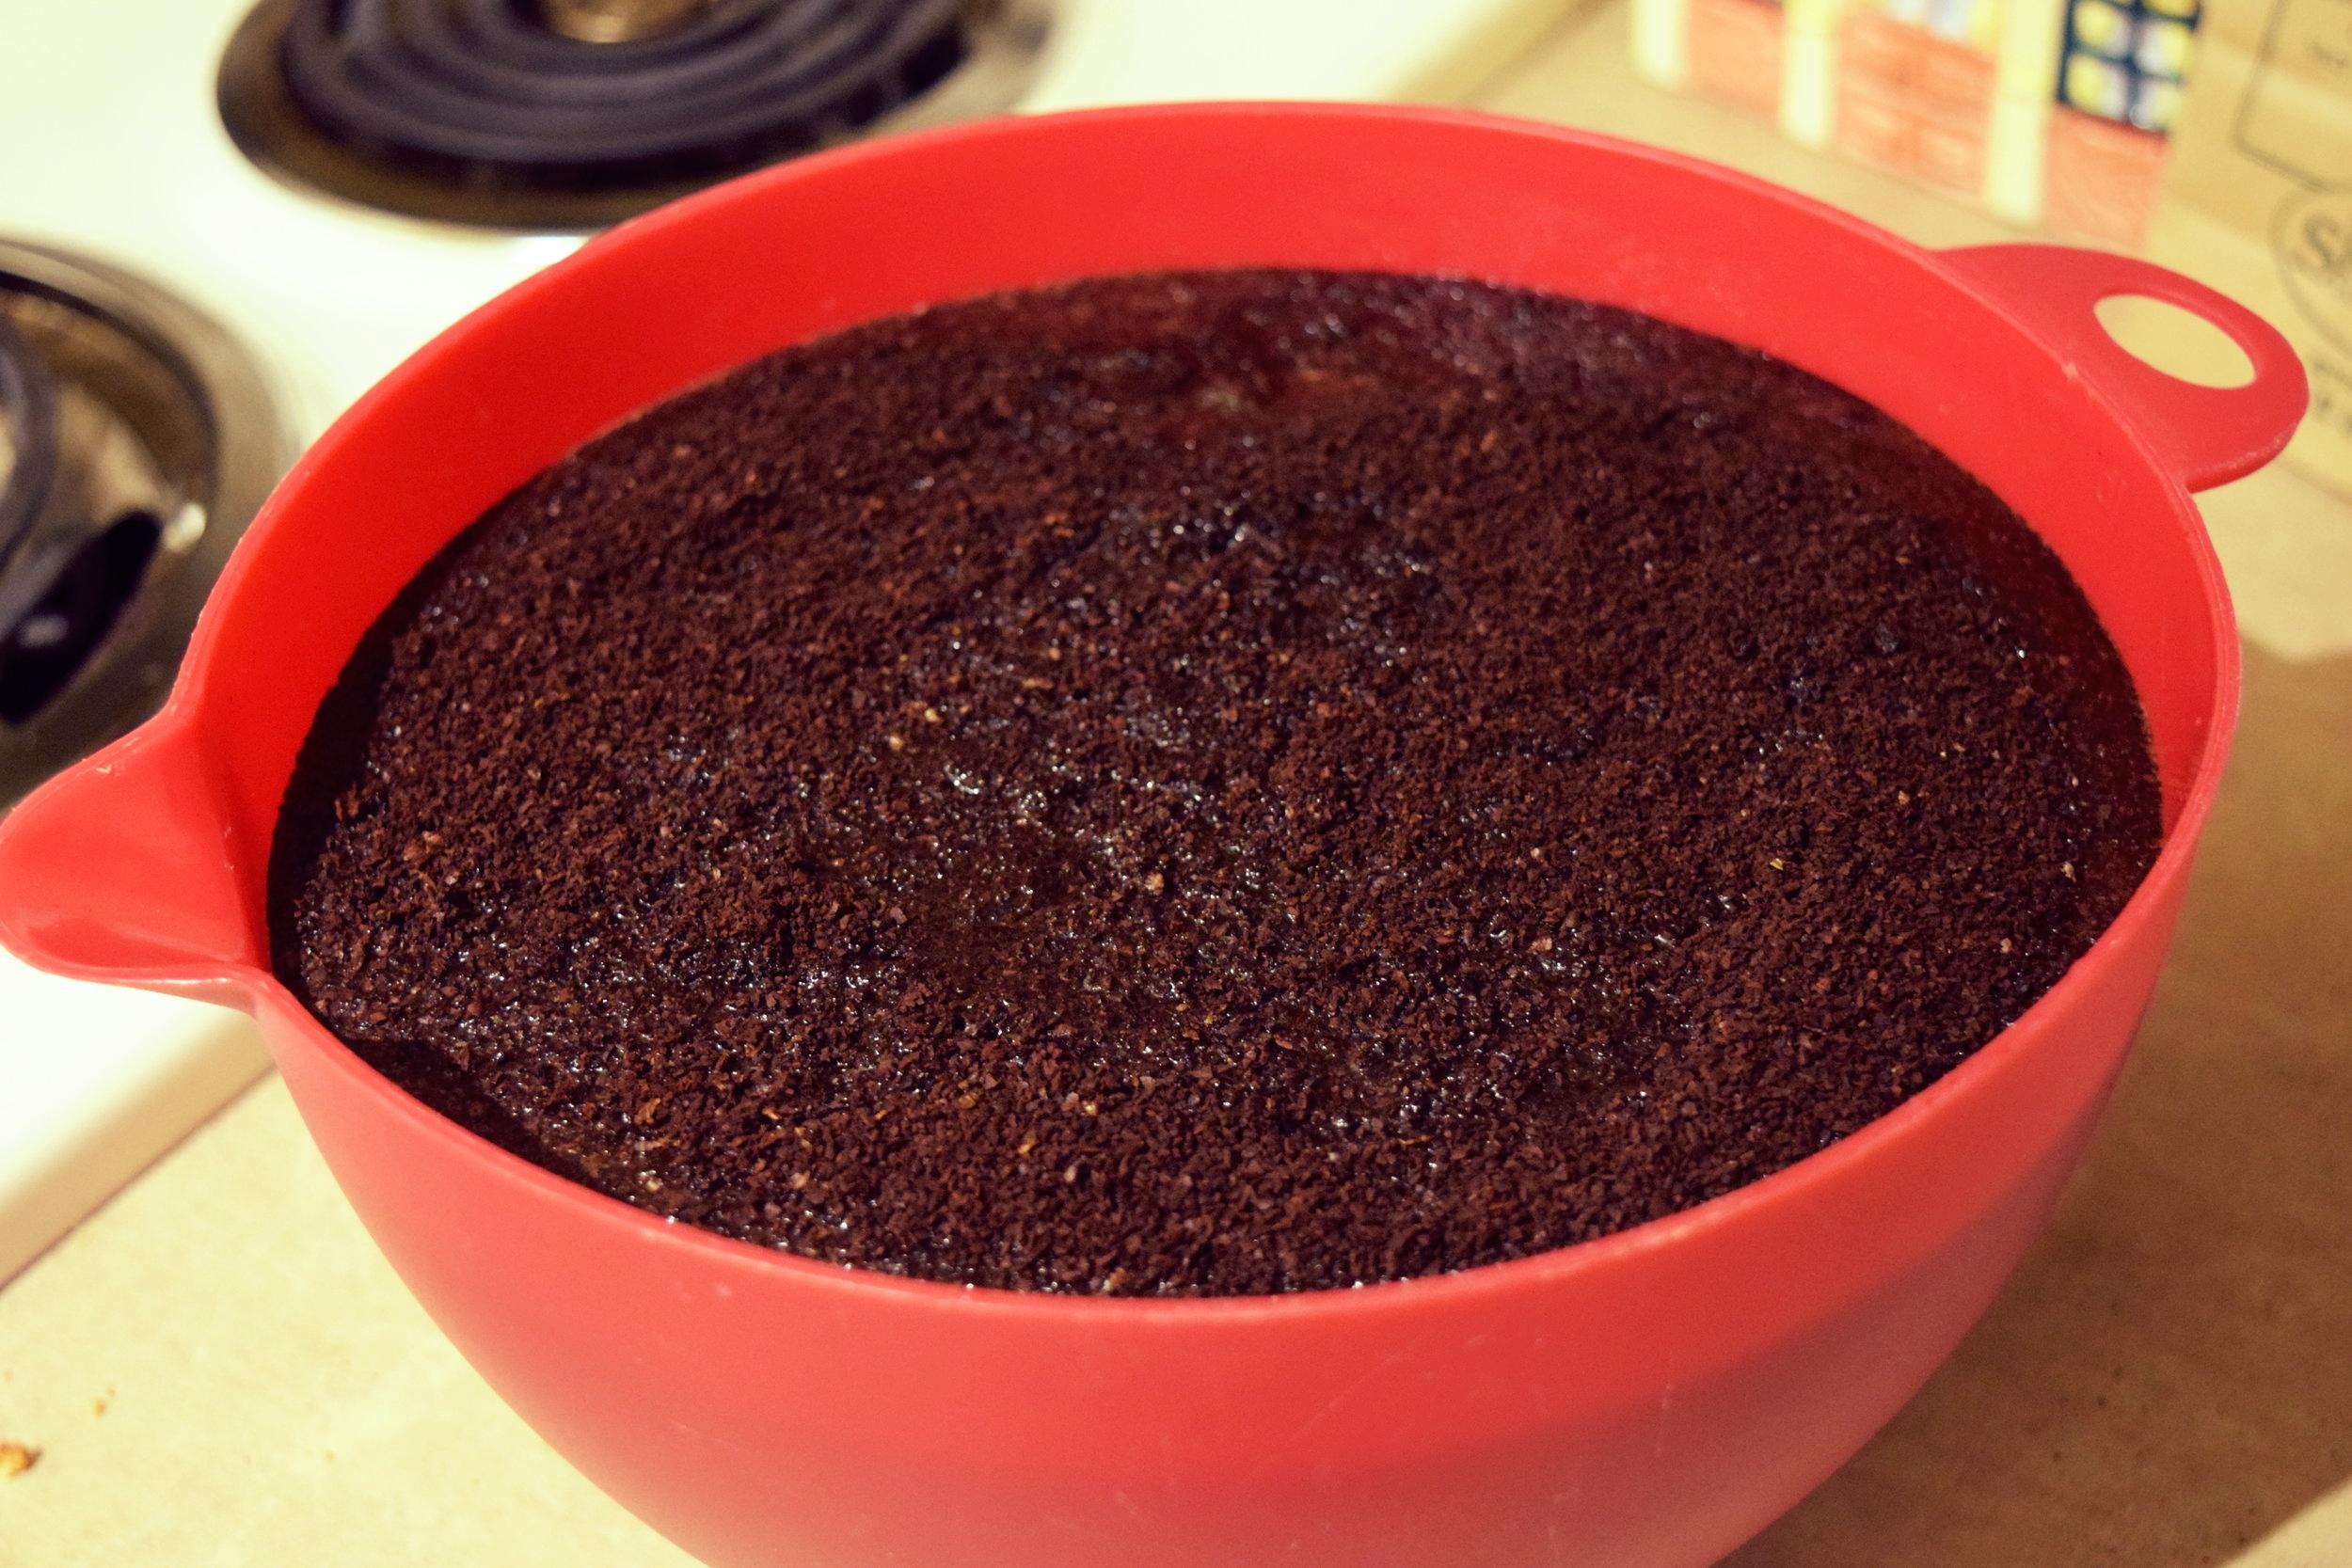 coarse_ground_coffee.JPG